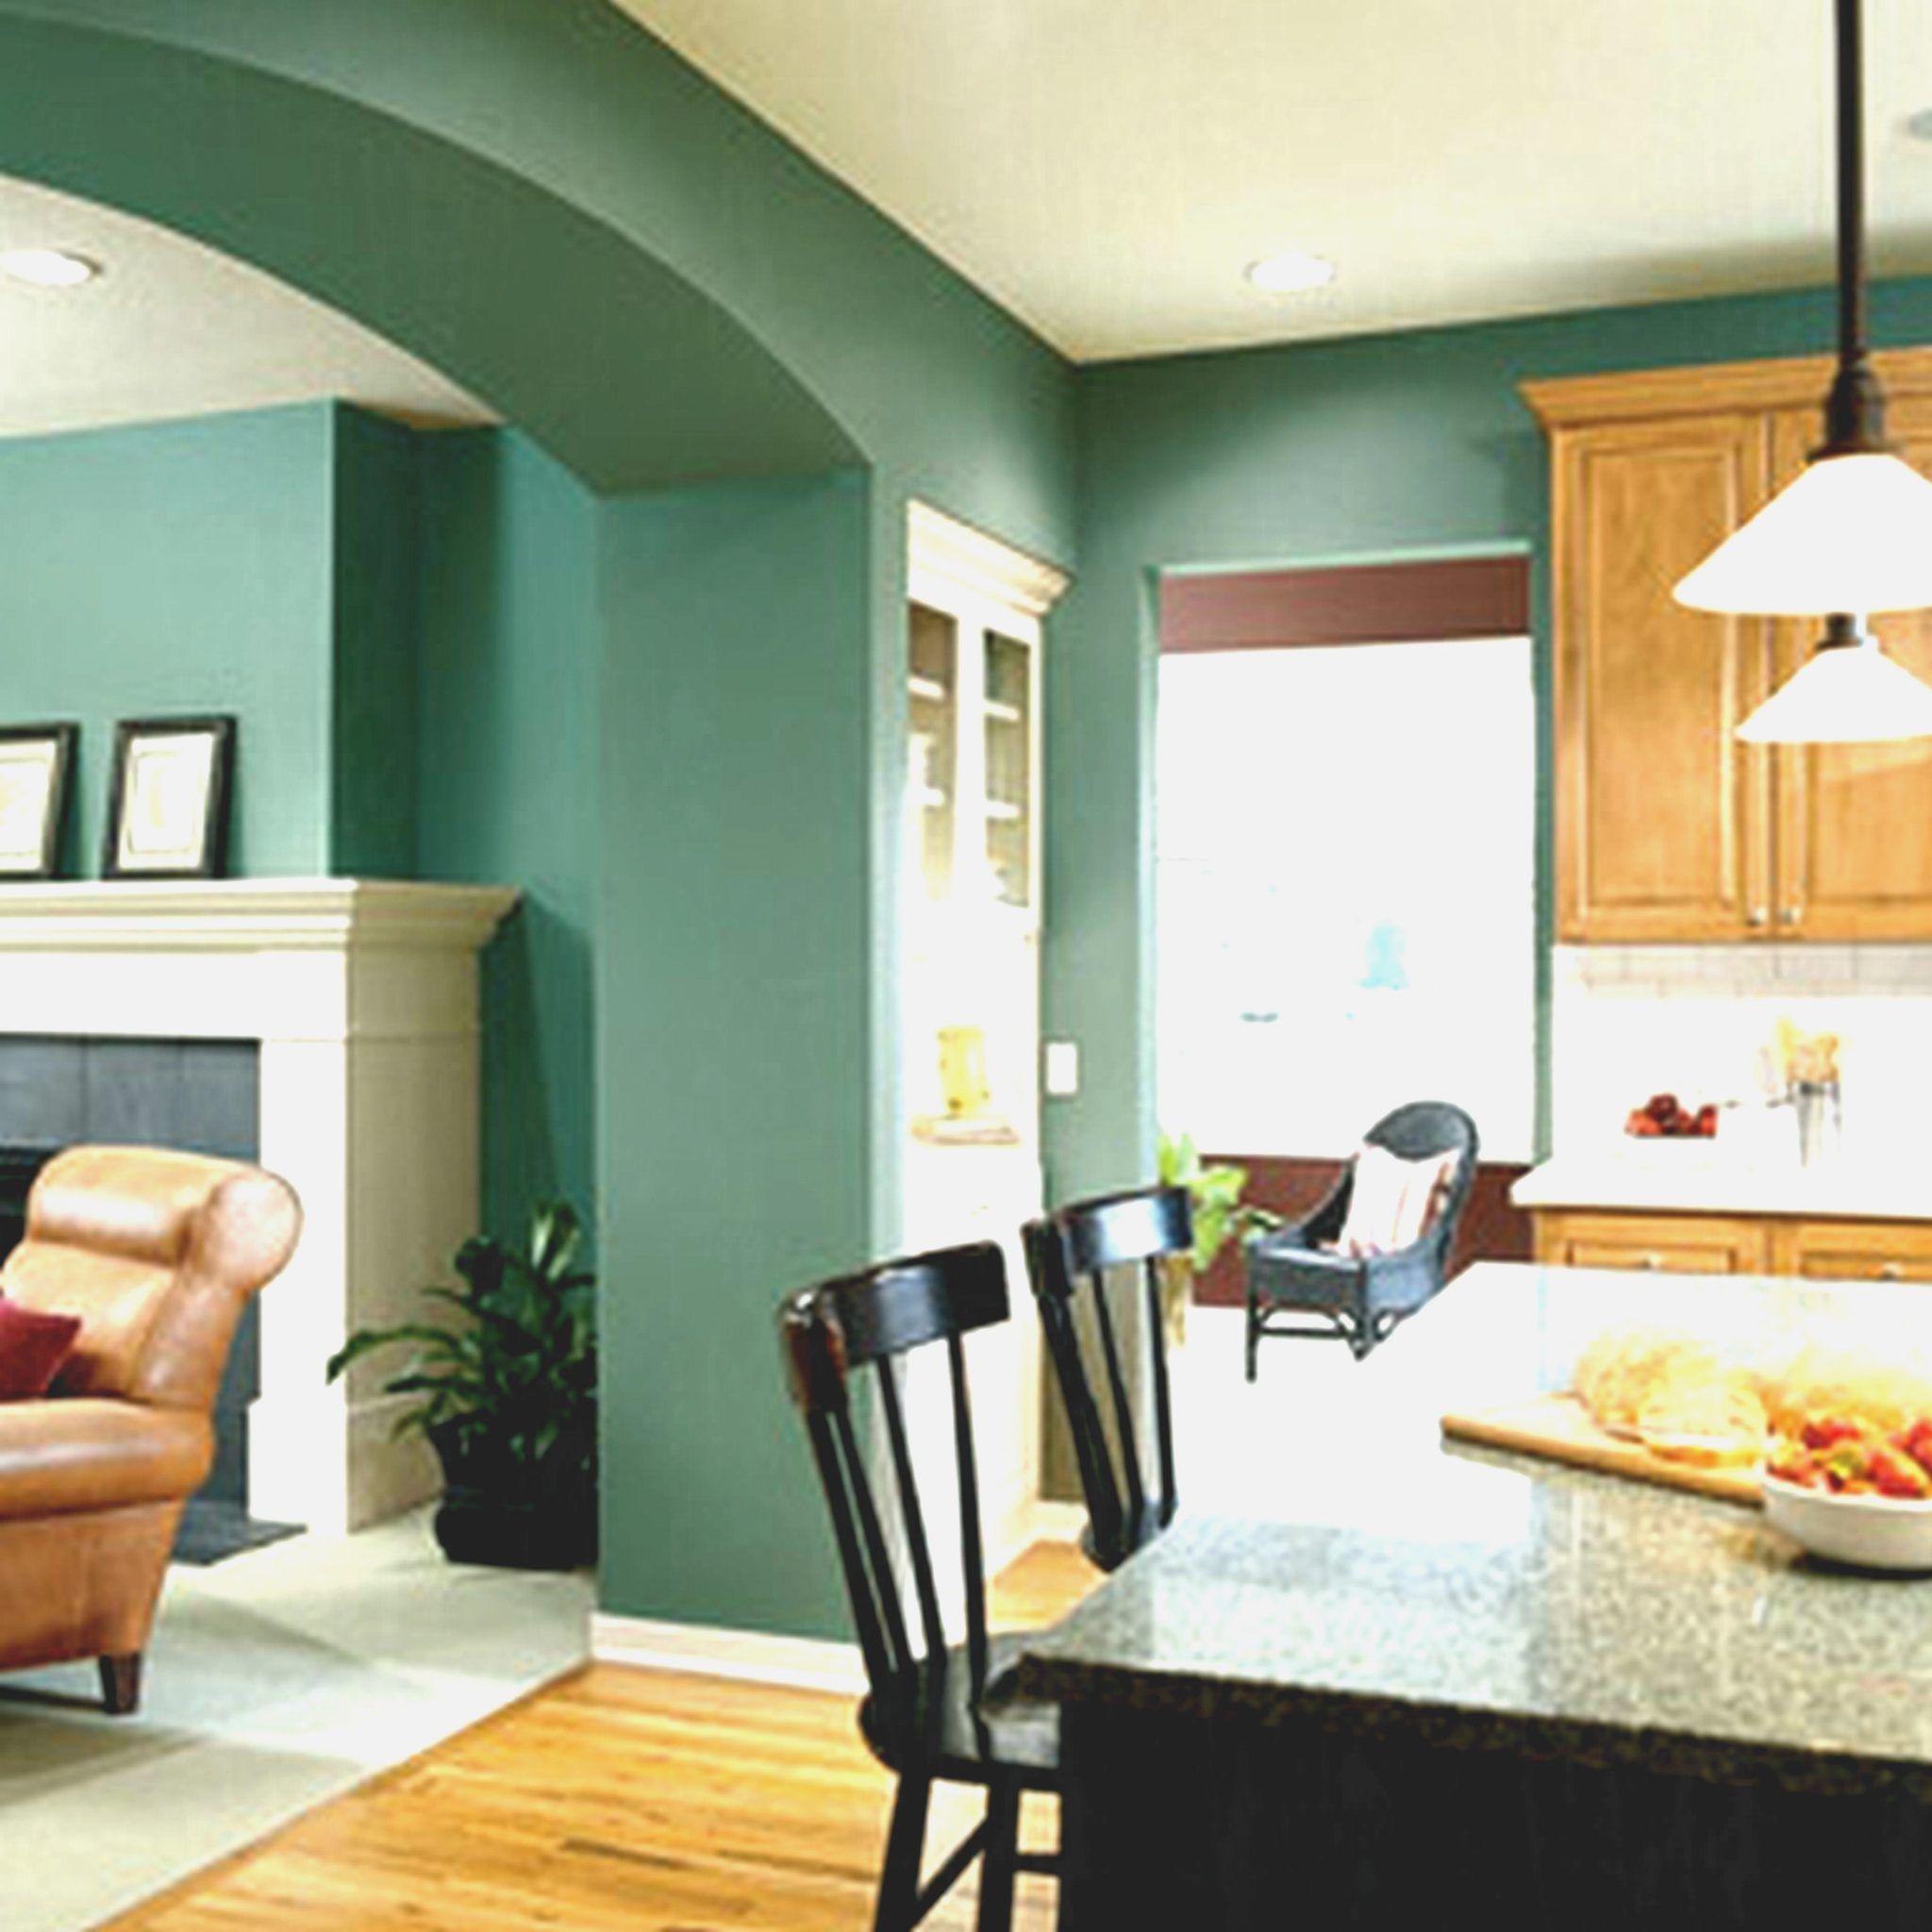 Best Color Paint Living Room Feng Shui Modern Design 2018 Colors For Walls Blue Choosing